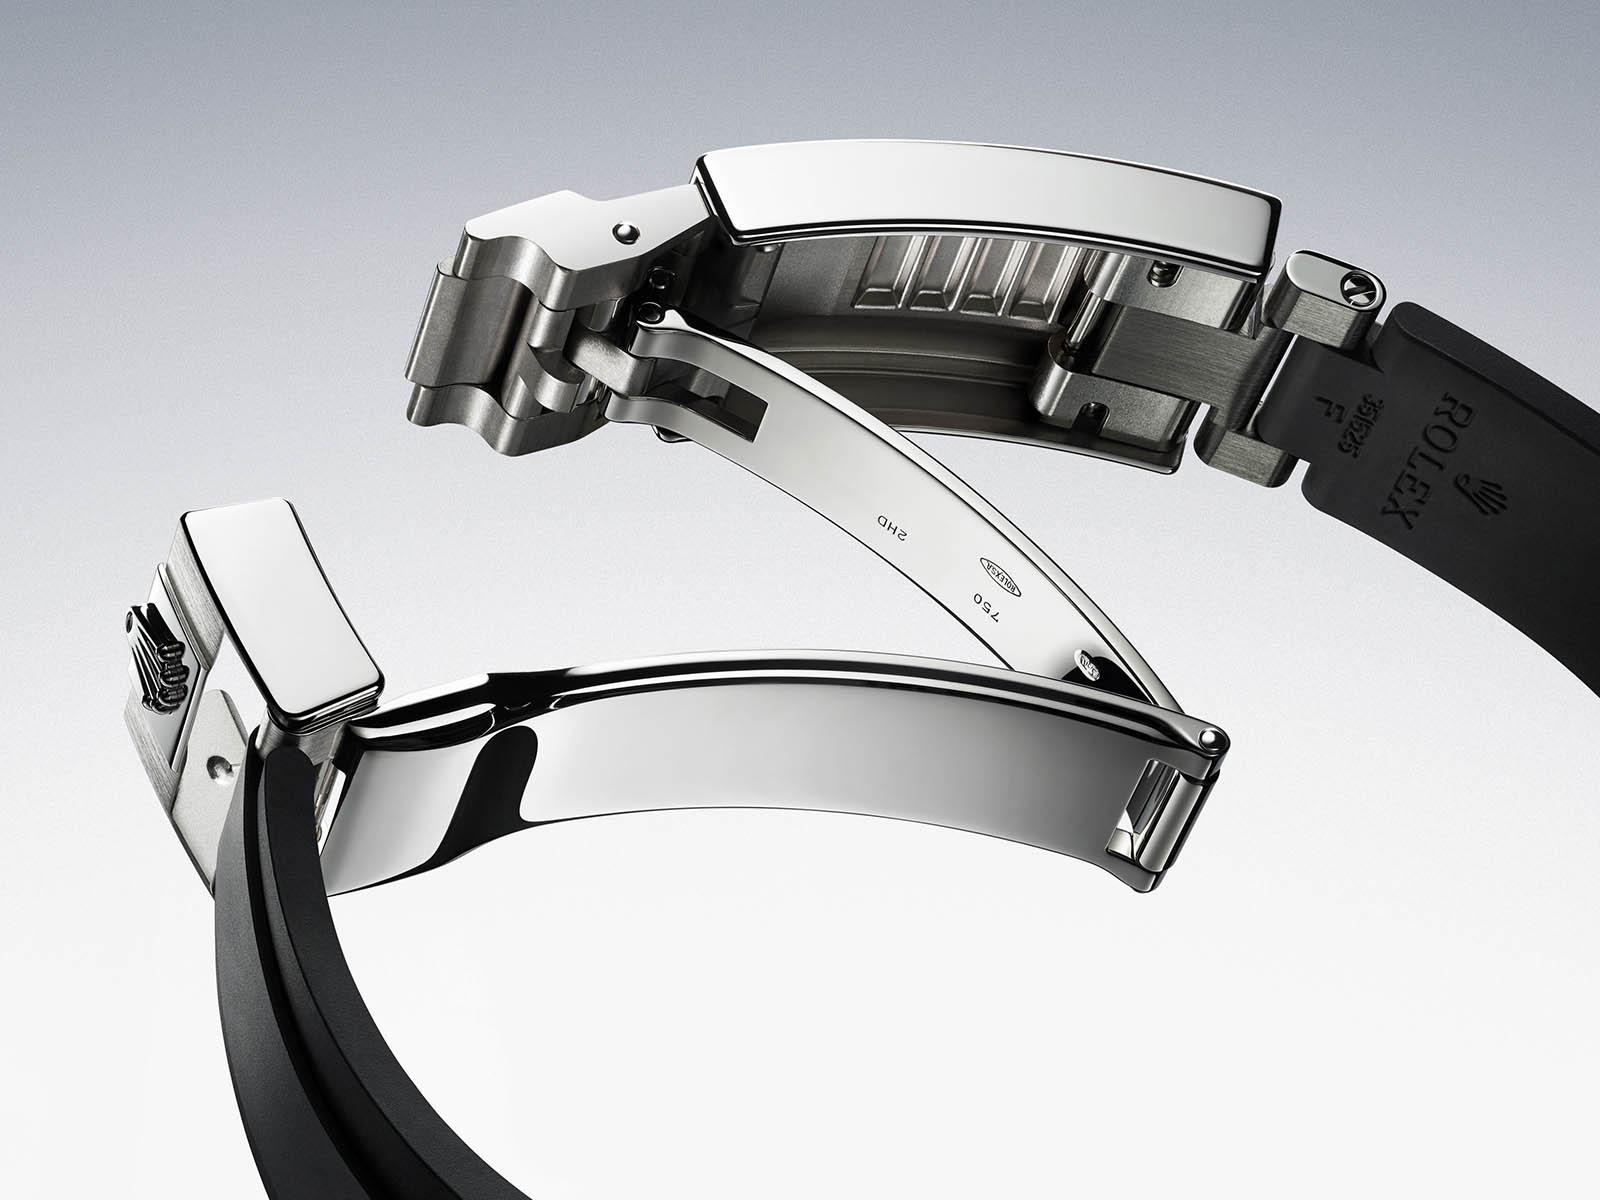 rolex-bracelets-and-straps-oysterflex-2.jpg